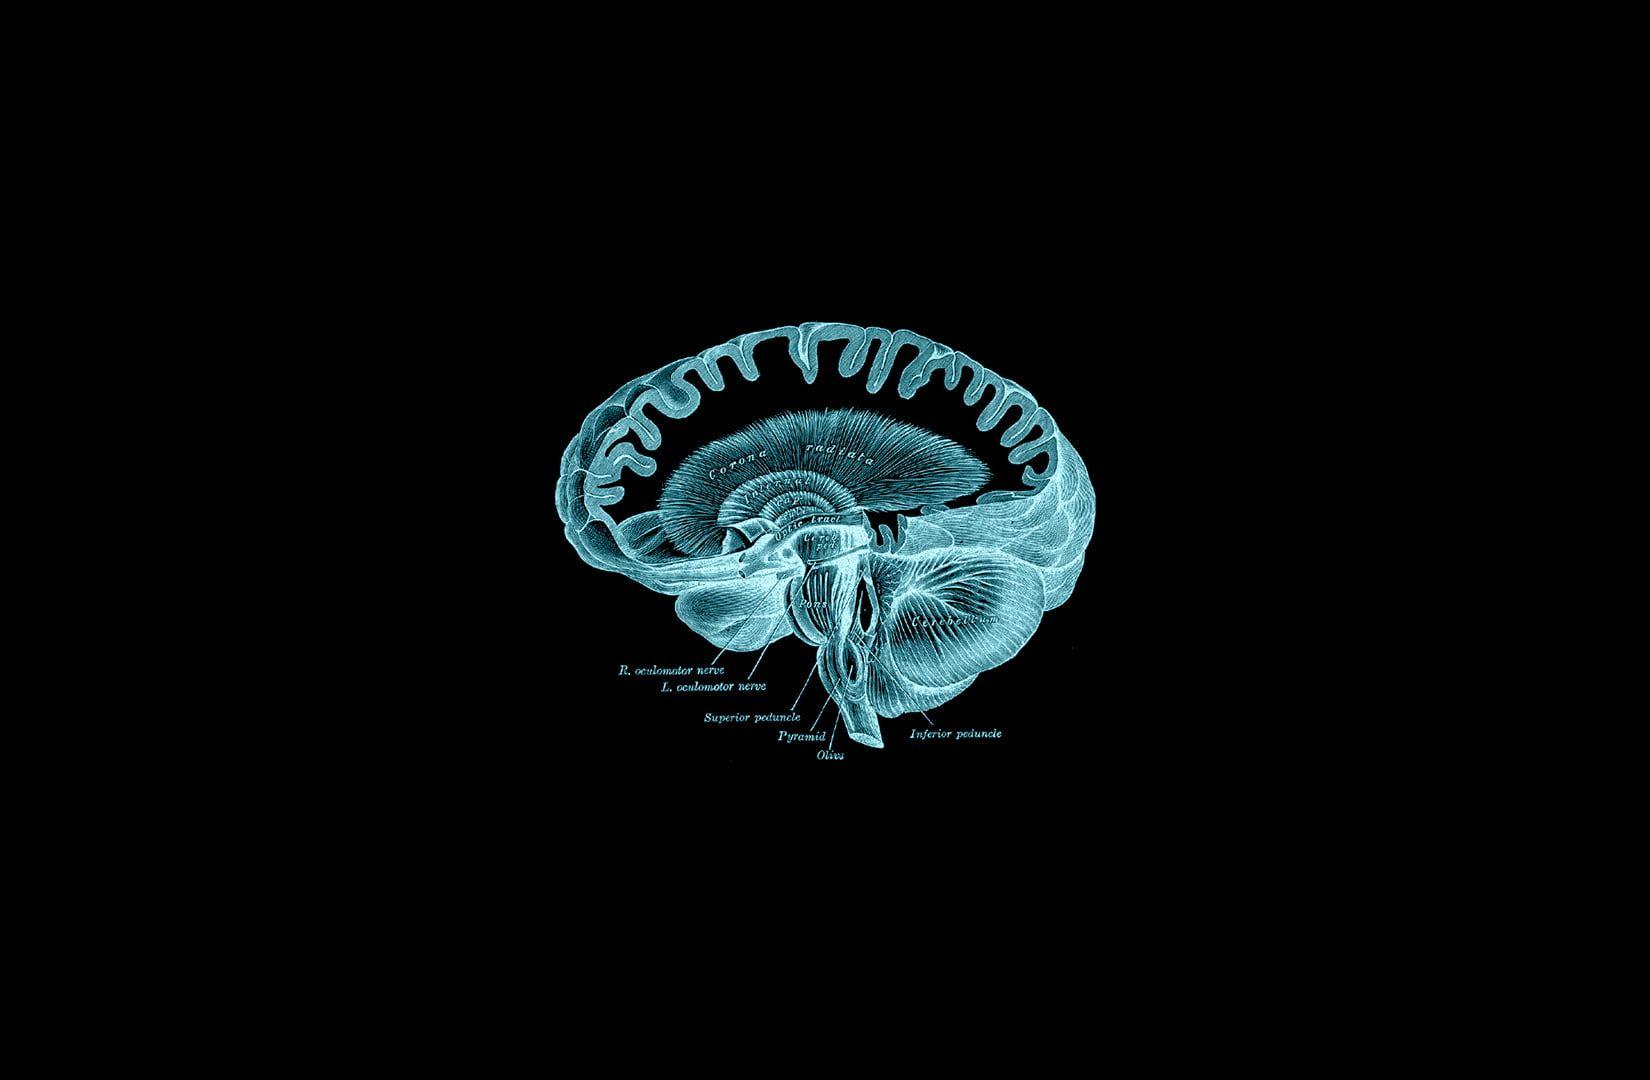 Brain Gray S Anatomy Book Anatomy Dark 720p Wallpaper Hdwallpaper Desktop Greys Anatomy Book Hd Wallpaper Wallpaper